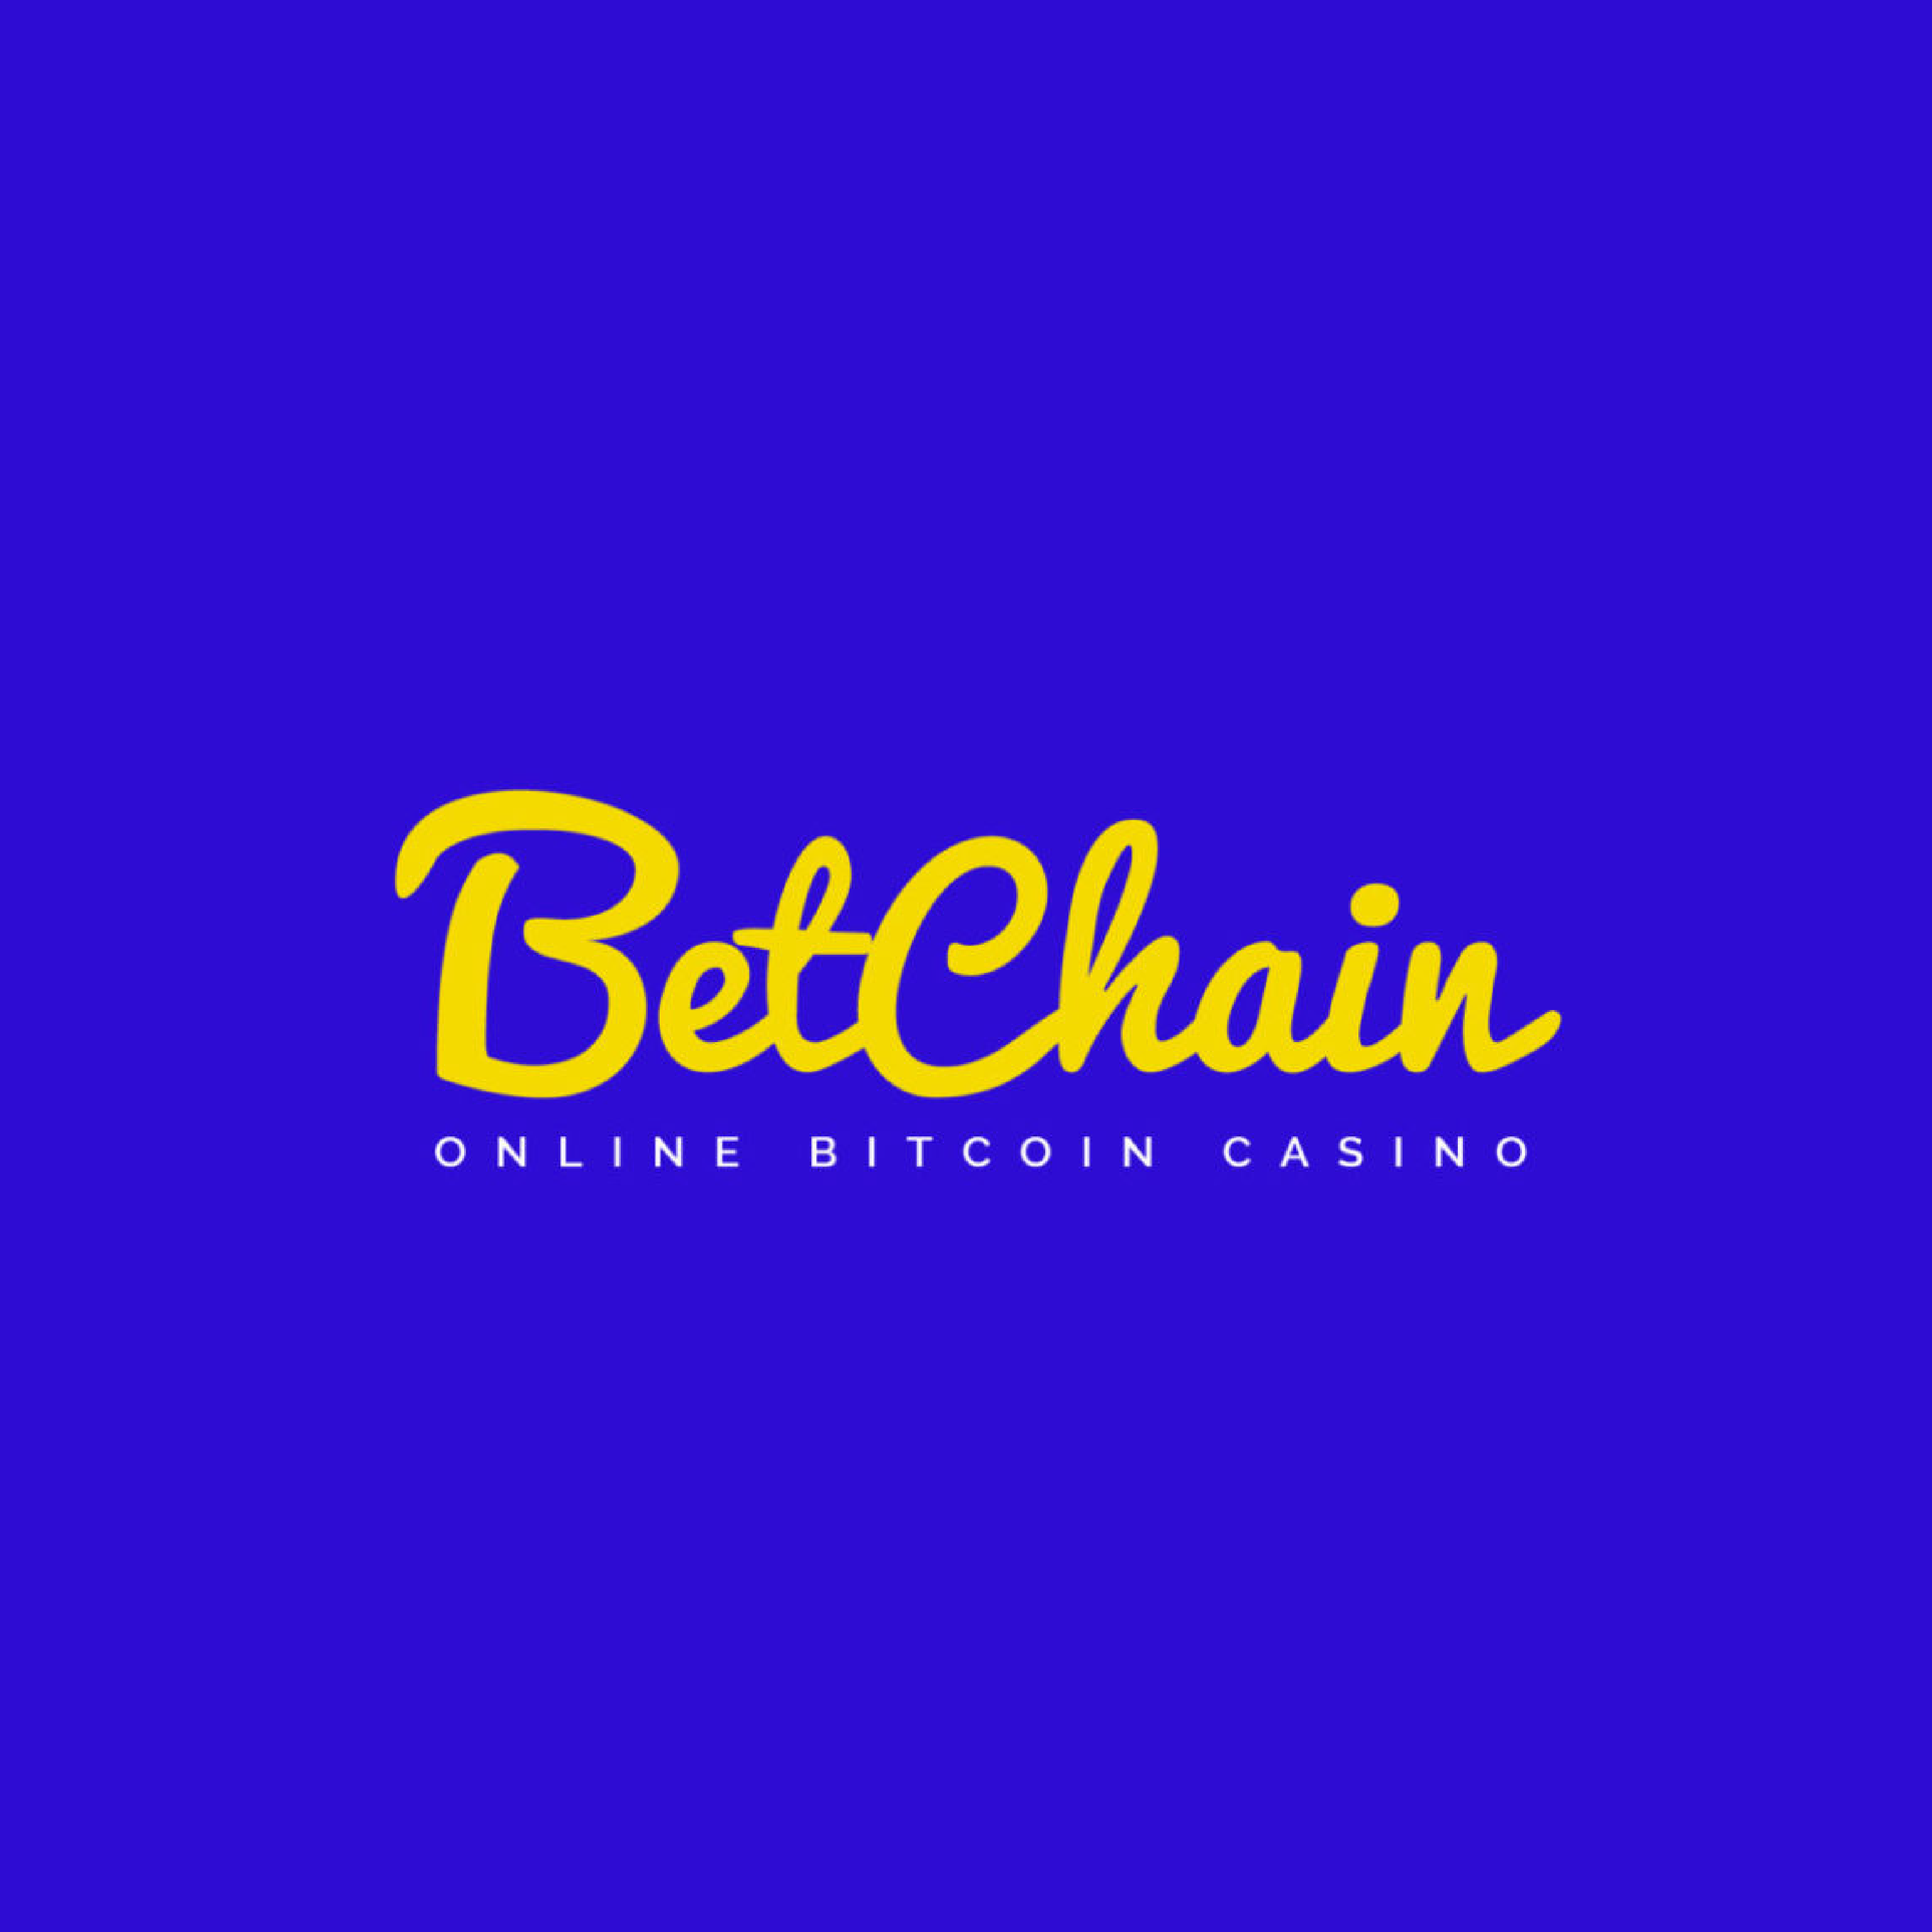 Free spins no deposit 777 bitcoin casino